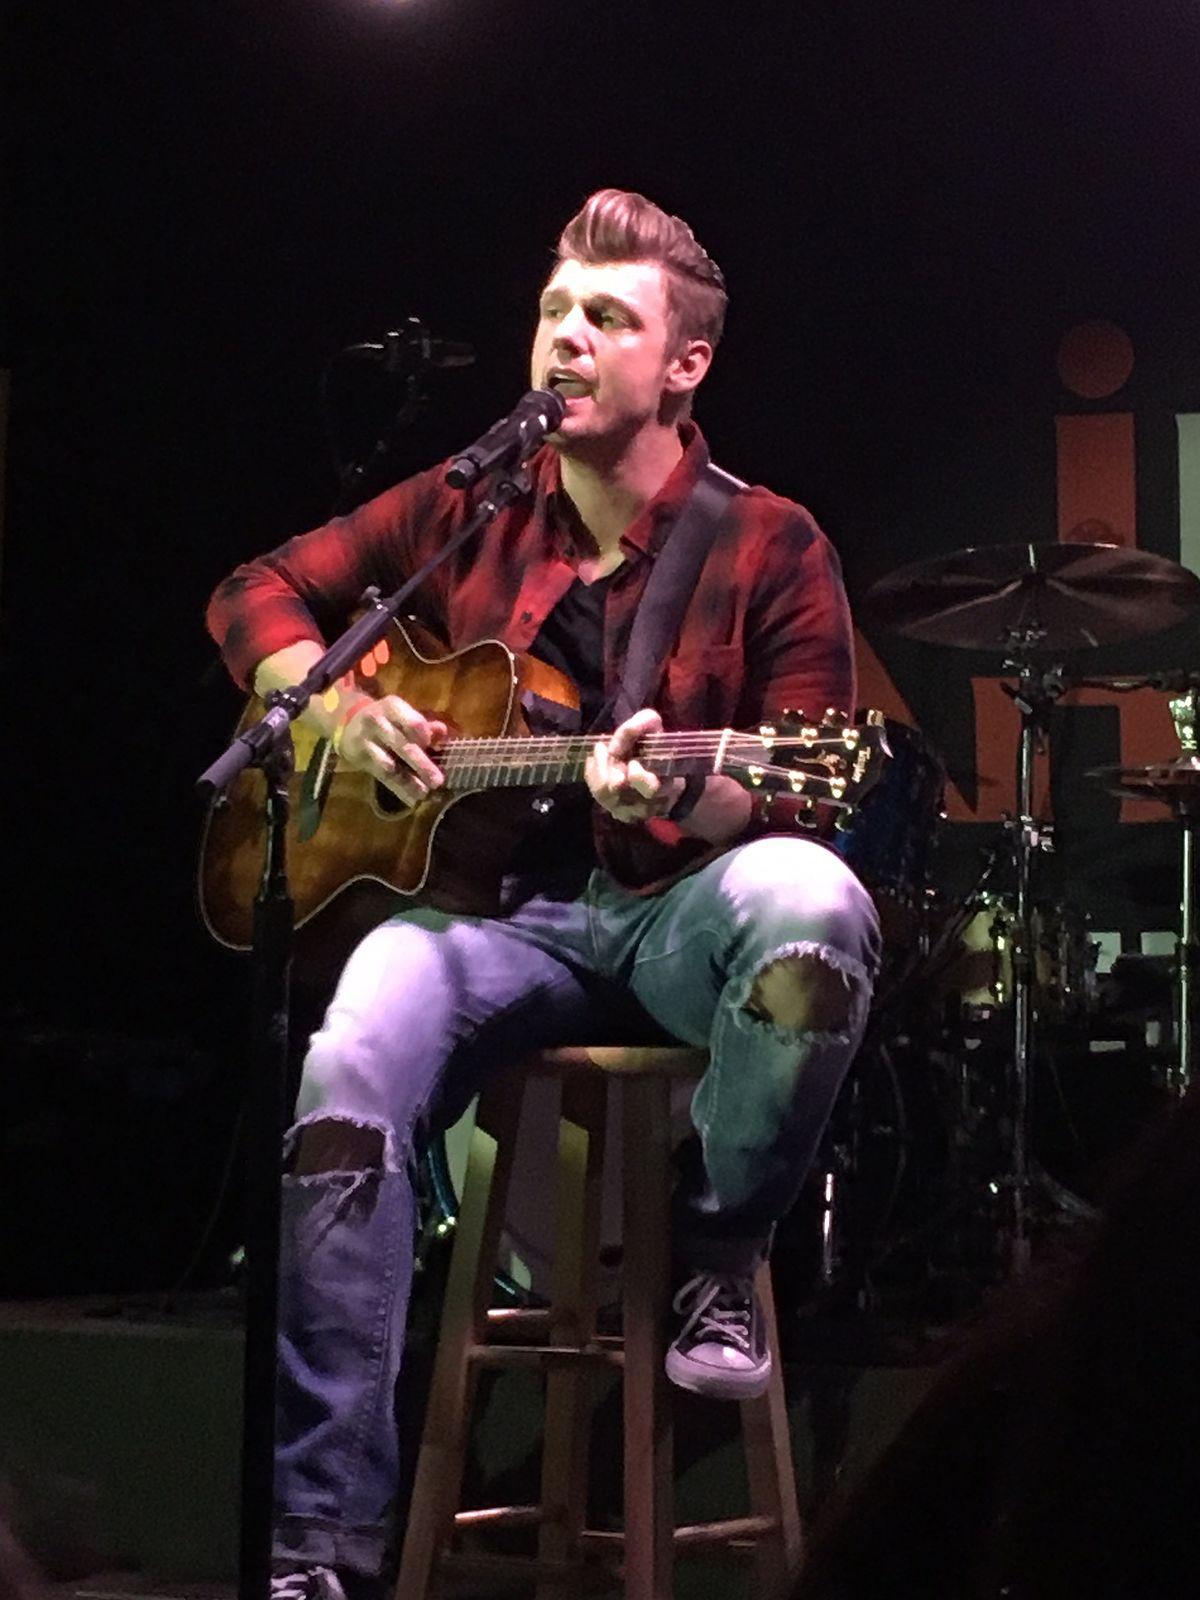 Nick Family Singing Show : family, singing, Carter, (musician), Wikipedia